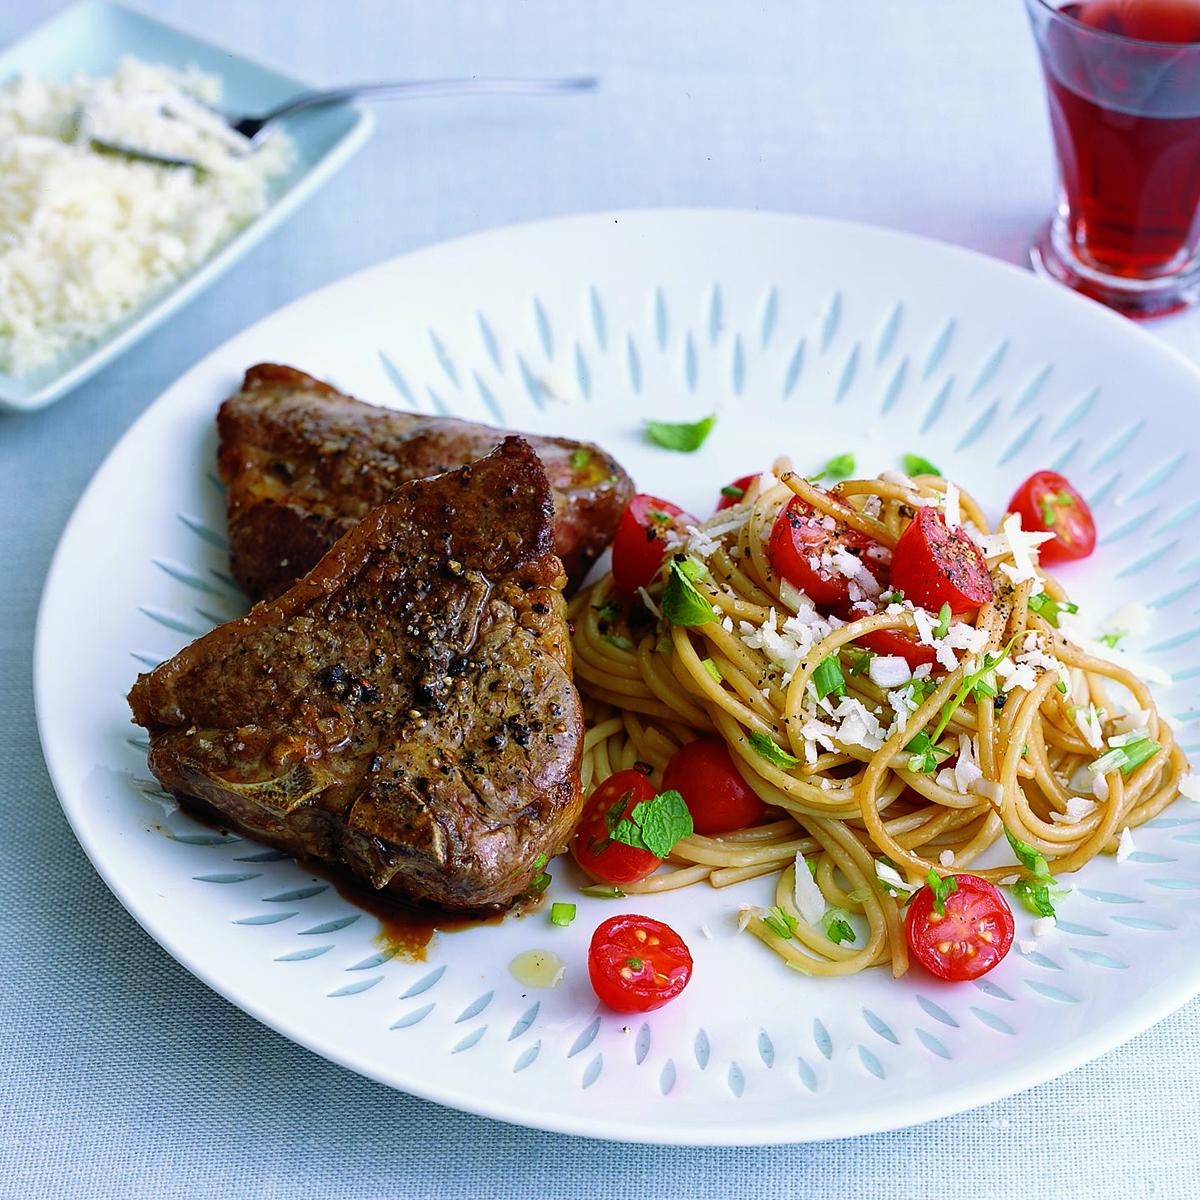 Lamb Chops and Spaghetti Salad with Raw Cherry Tomato Sauce